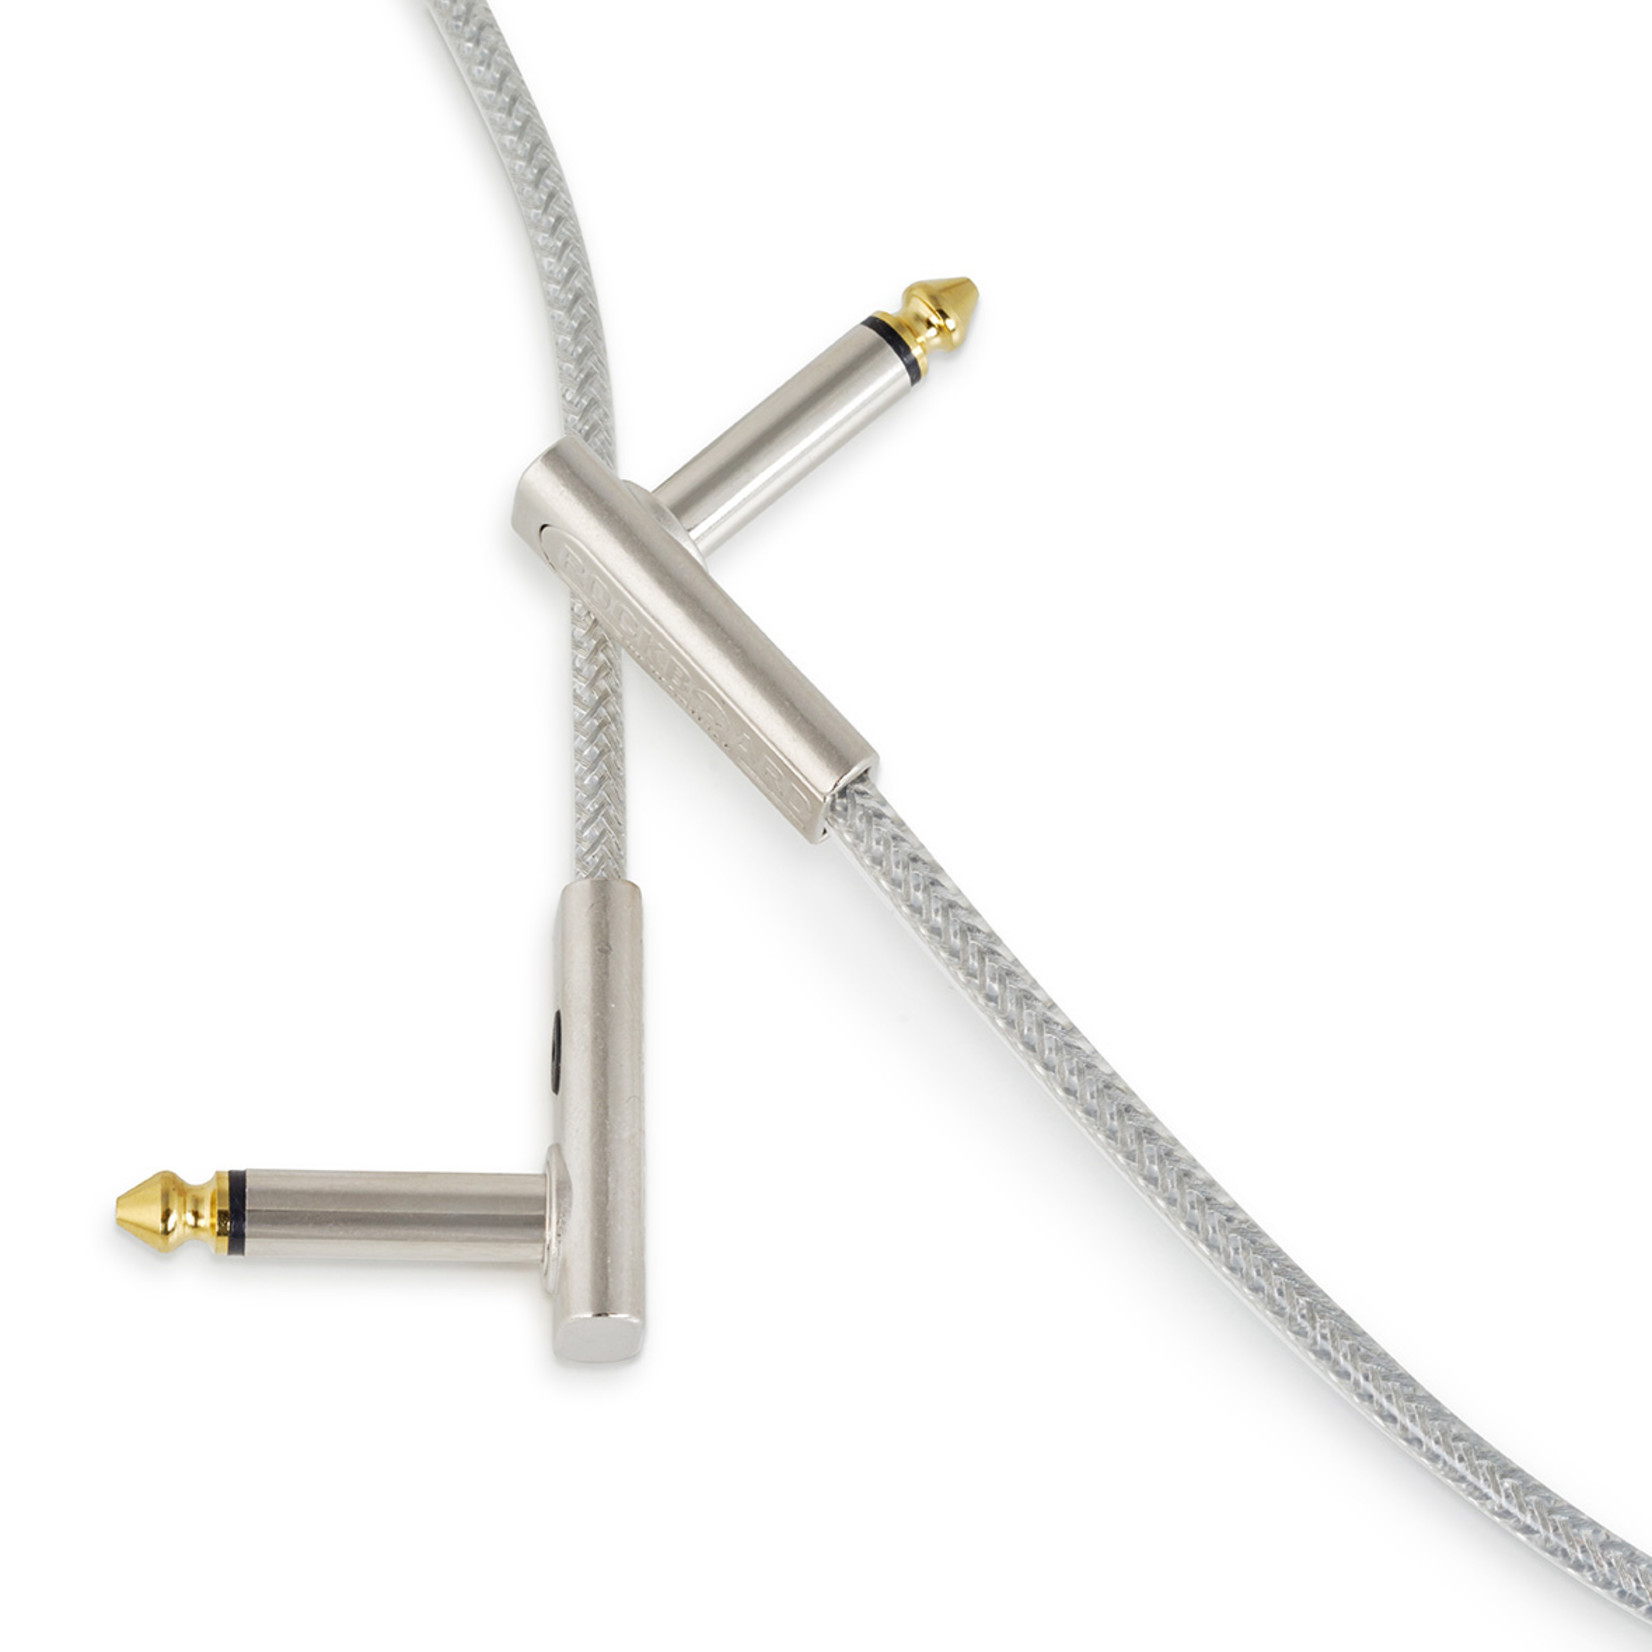 "Rockboard RockBoard Flat Patch Cable Sapphire Series - 120 cm / 47 1/4"""